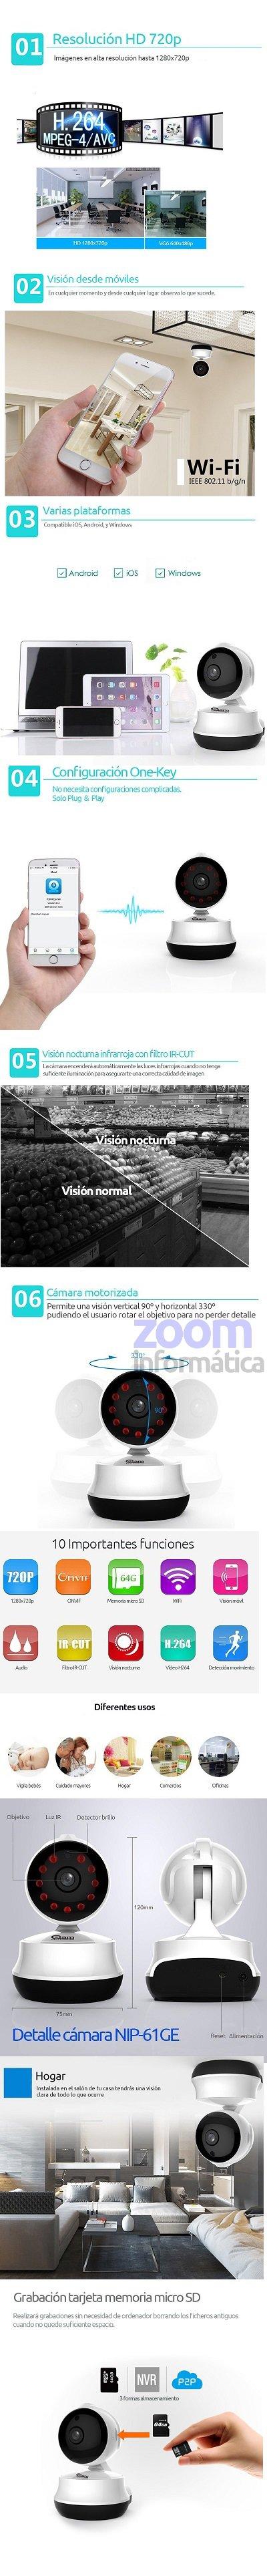 Neo coolcam CAMARA VIGILANCIA INTERIOR 32GB CON ROUTER 3G